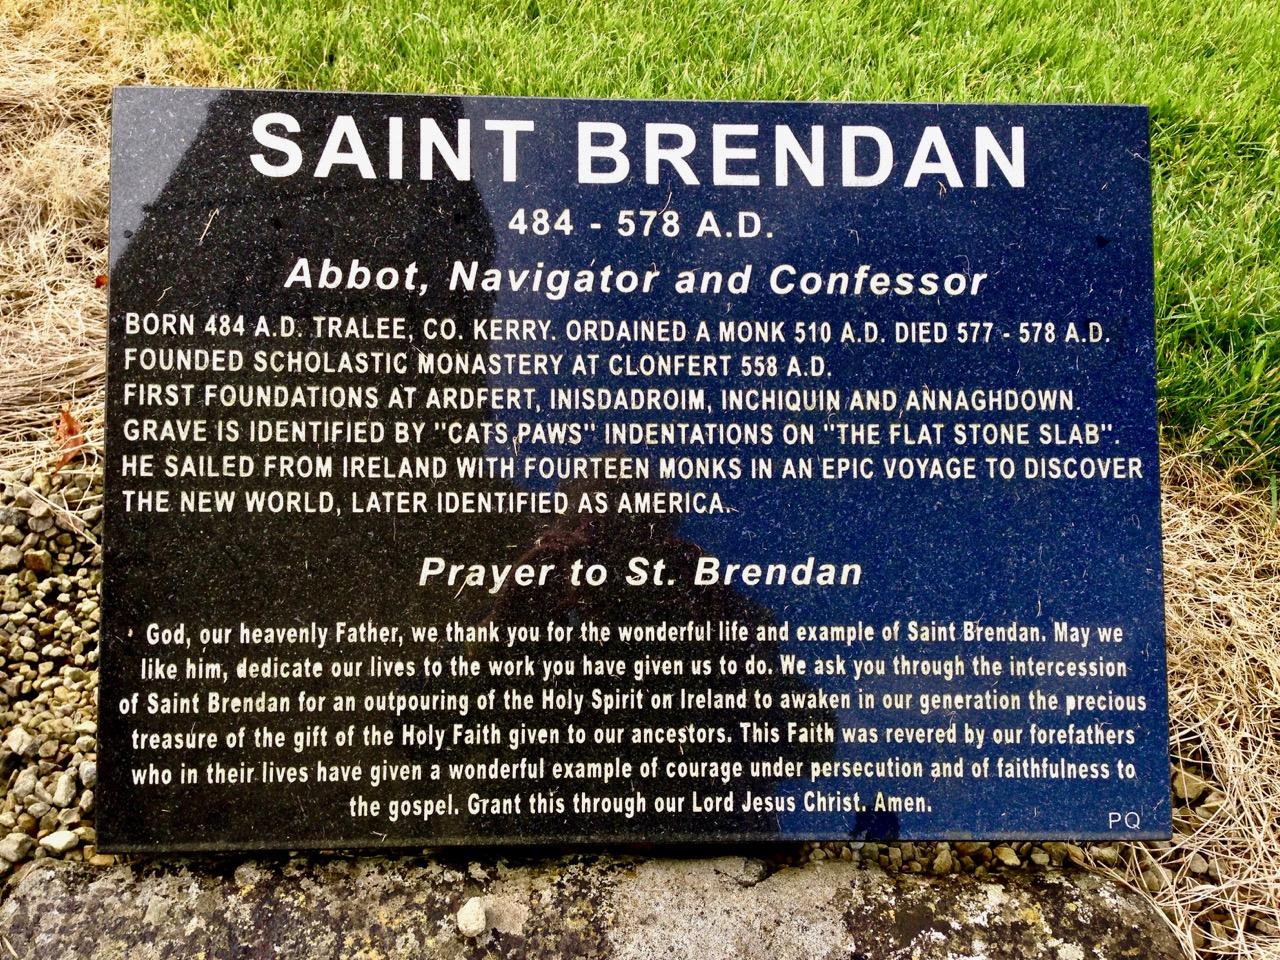 st brendan's grave inscription